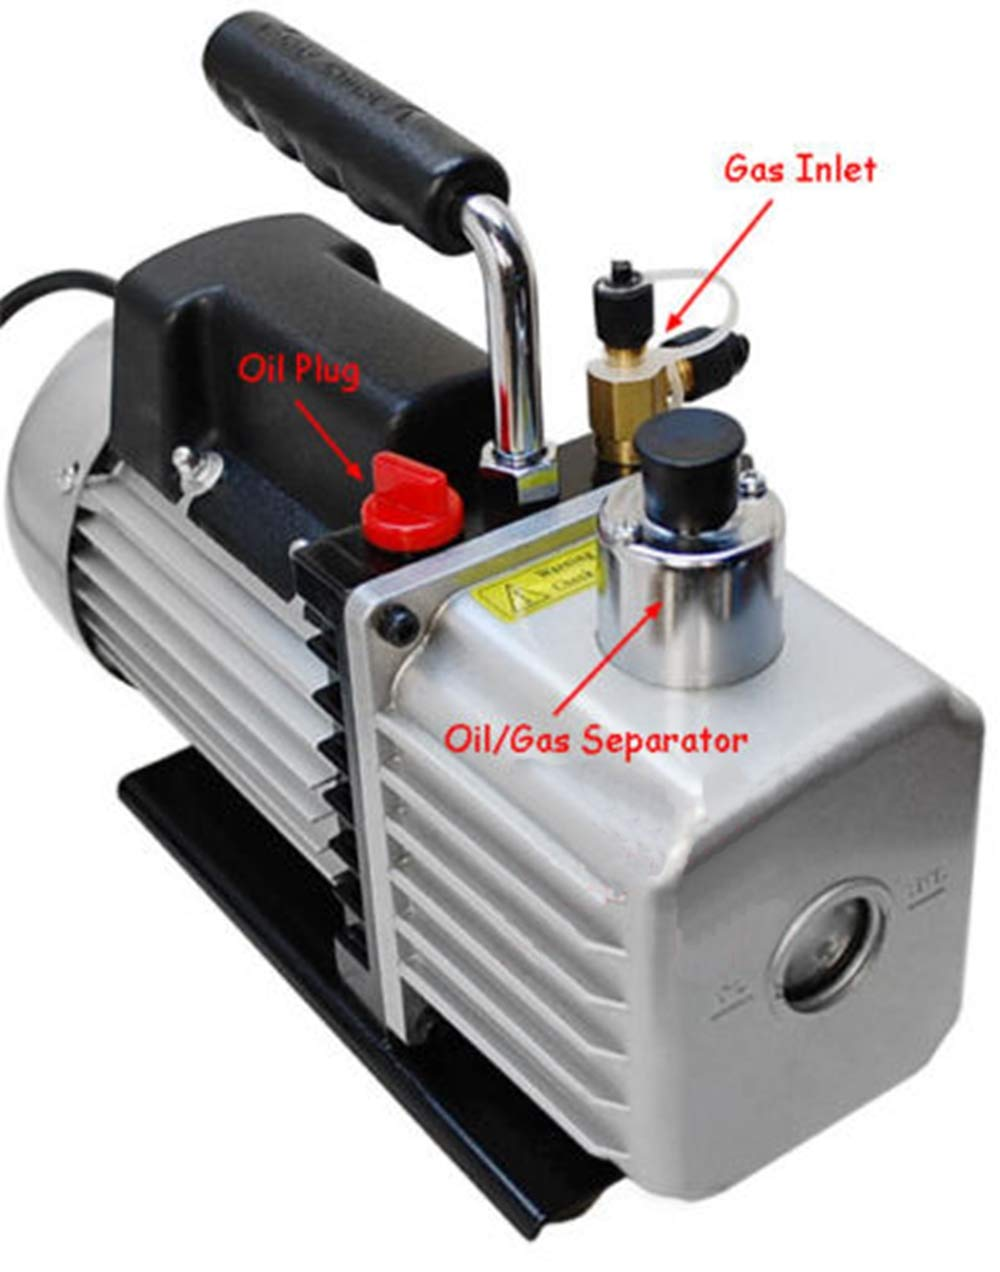 ees.2 Stage Electric Refrigerant 2.5CFM Vacuum Pump HVAC 1/3HP Pumping System